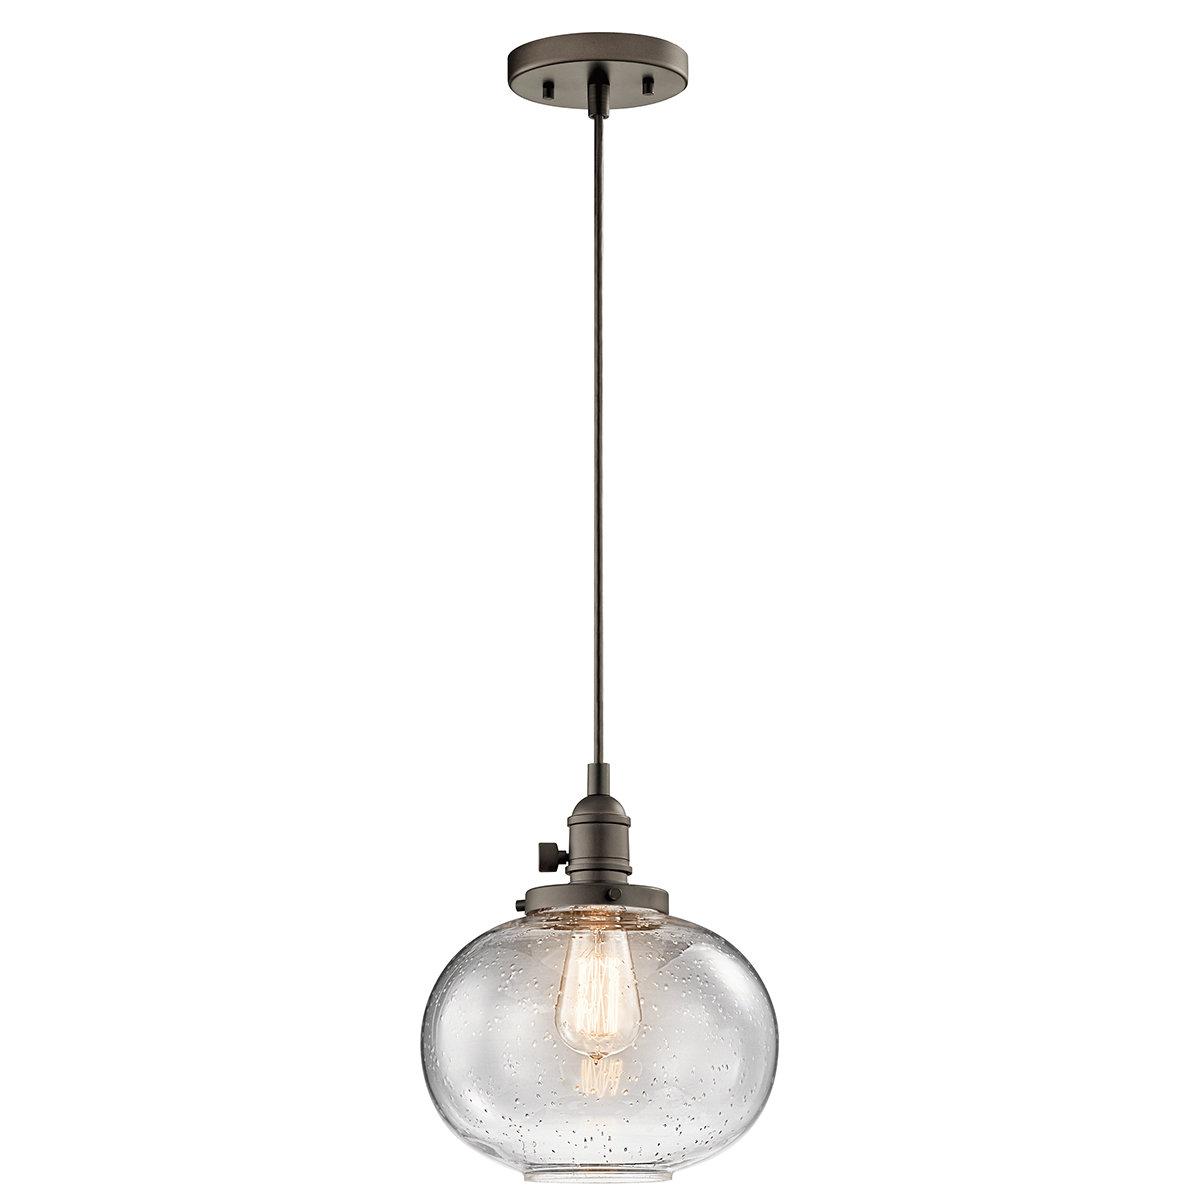 2020 Antioch 1-Light Single Globe Pendant intended for Betsy 1-Light Single Globe Pendants